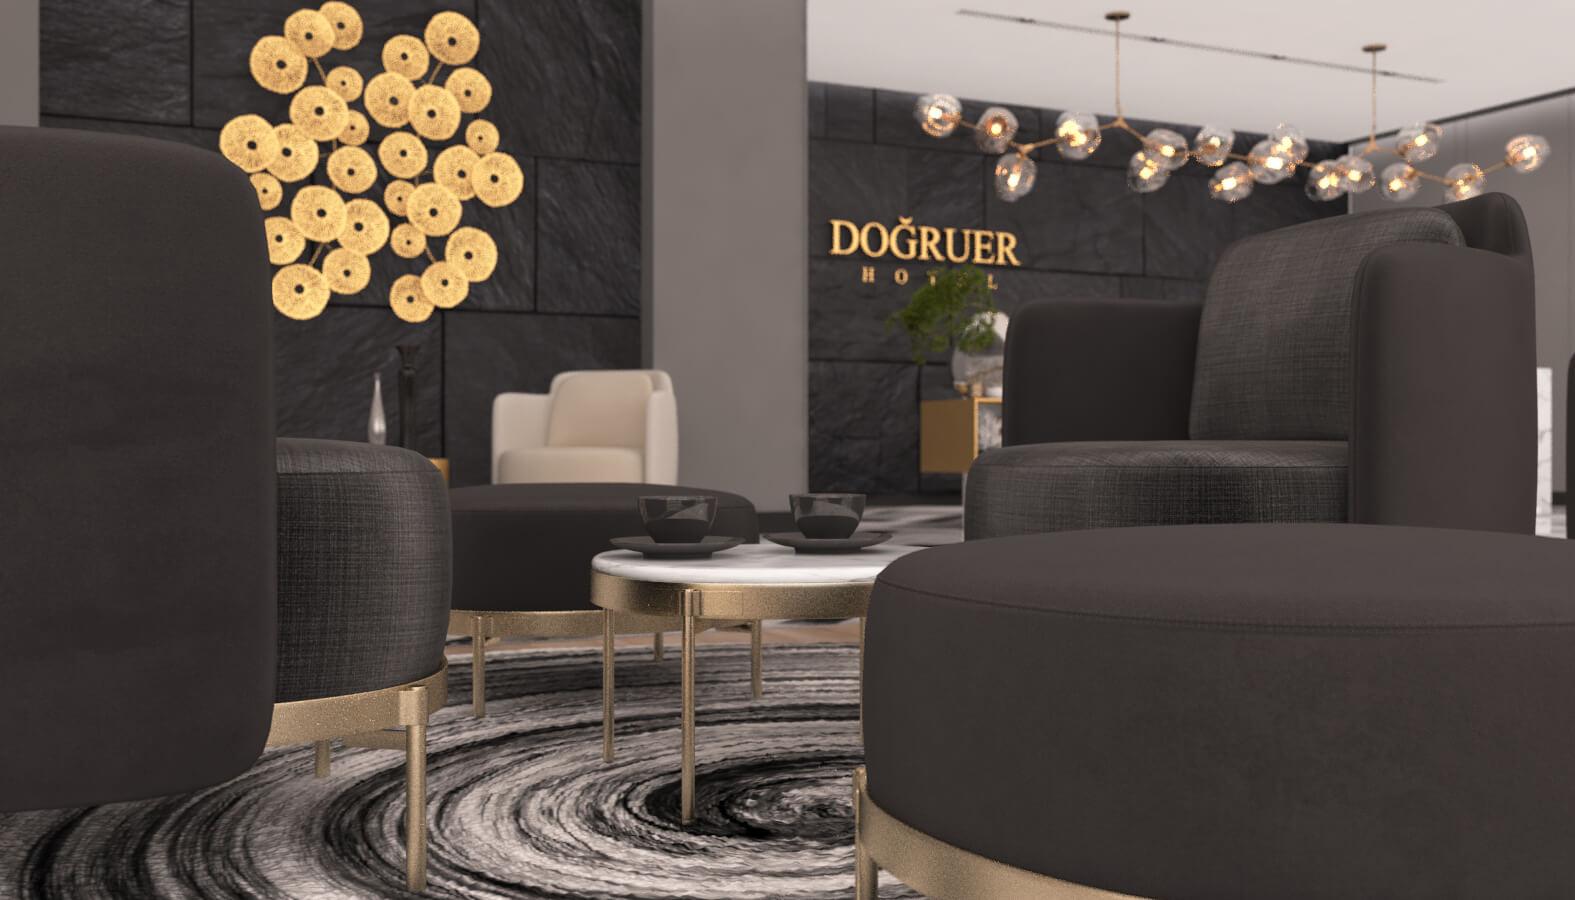 Hotel Architecture and Interior Design Dogruer hotel